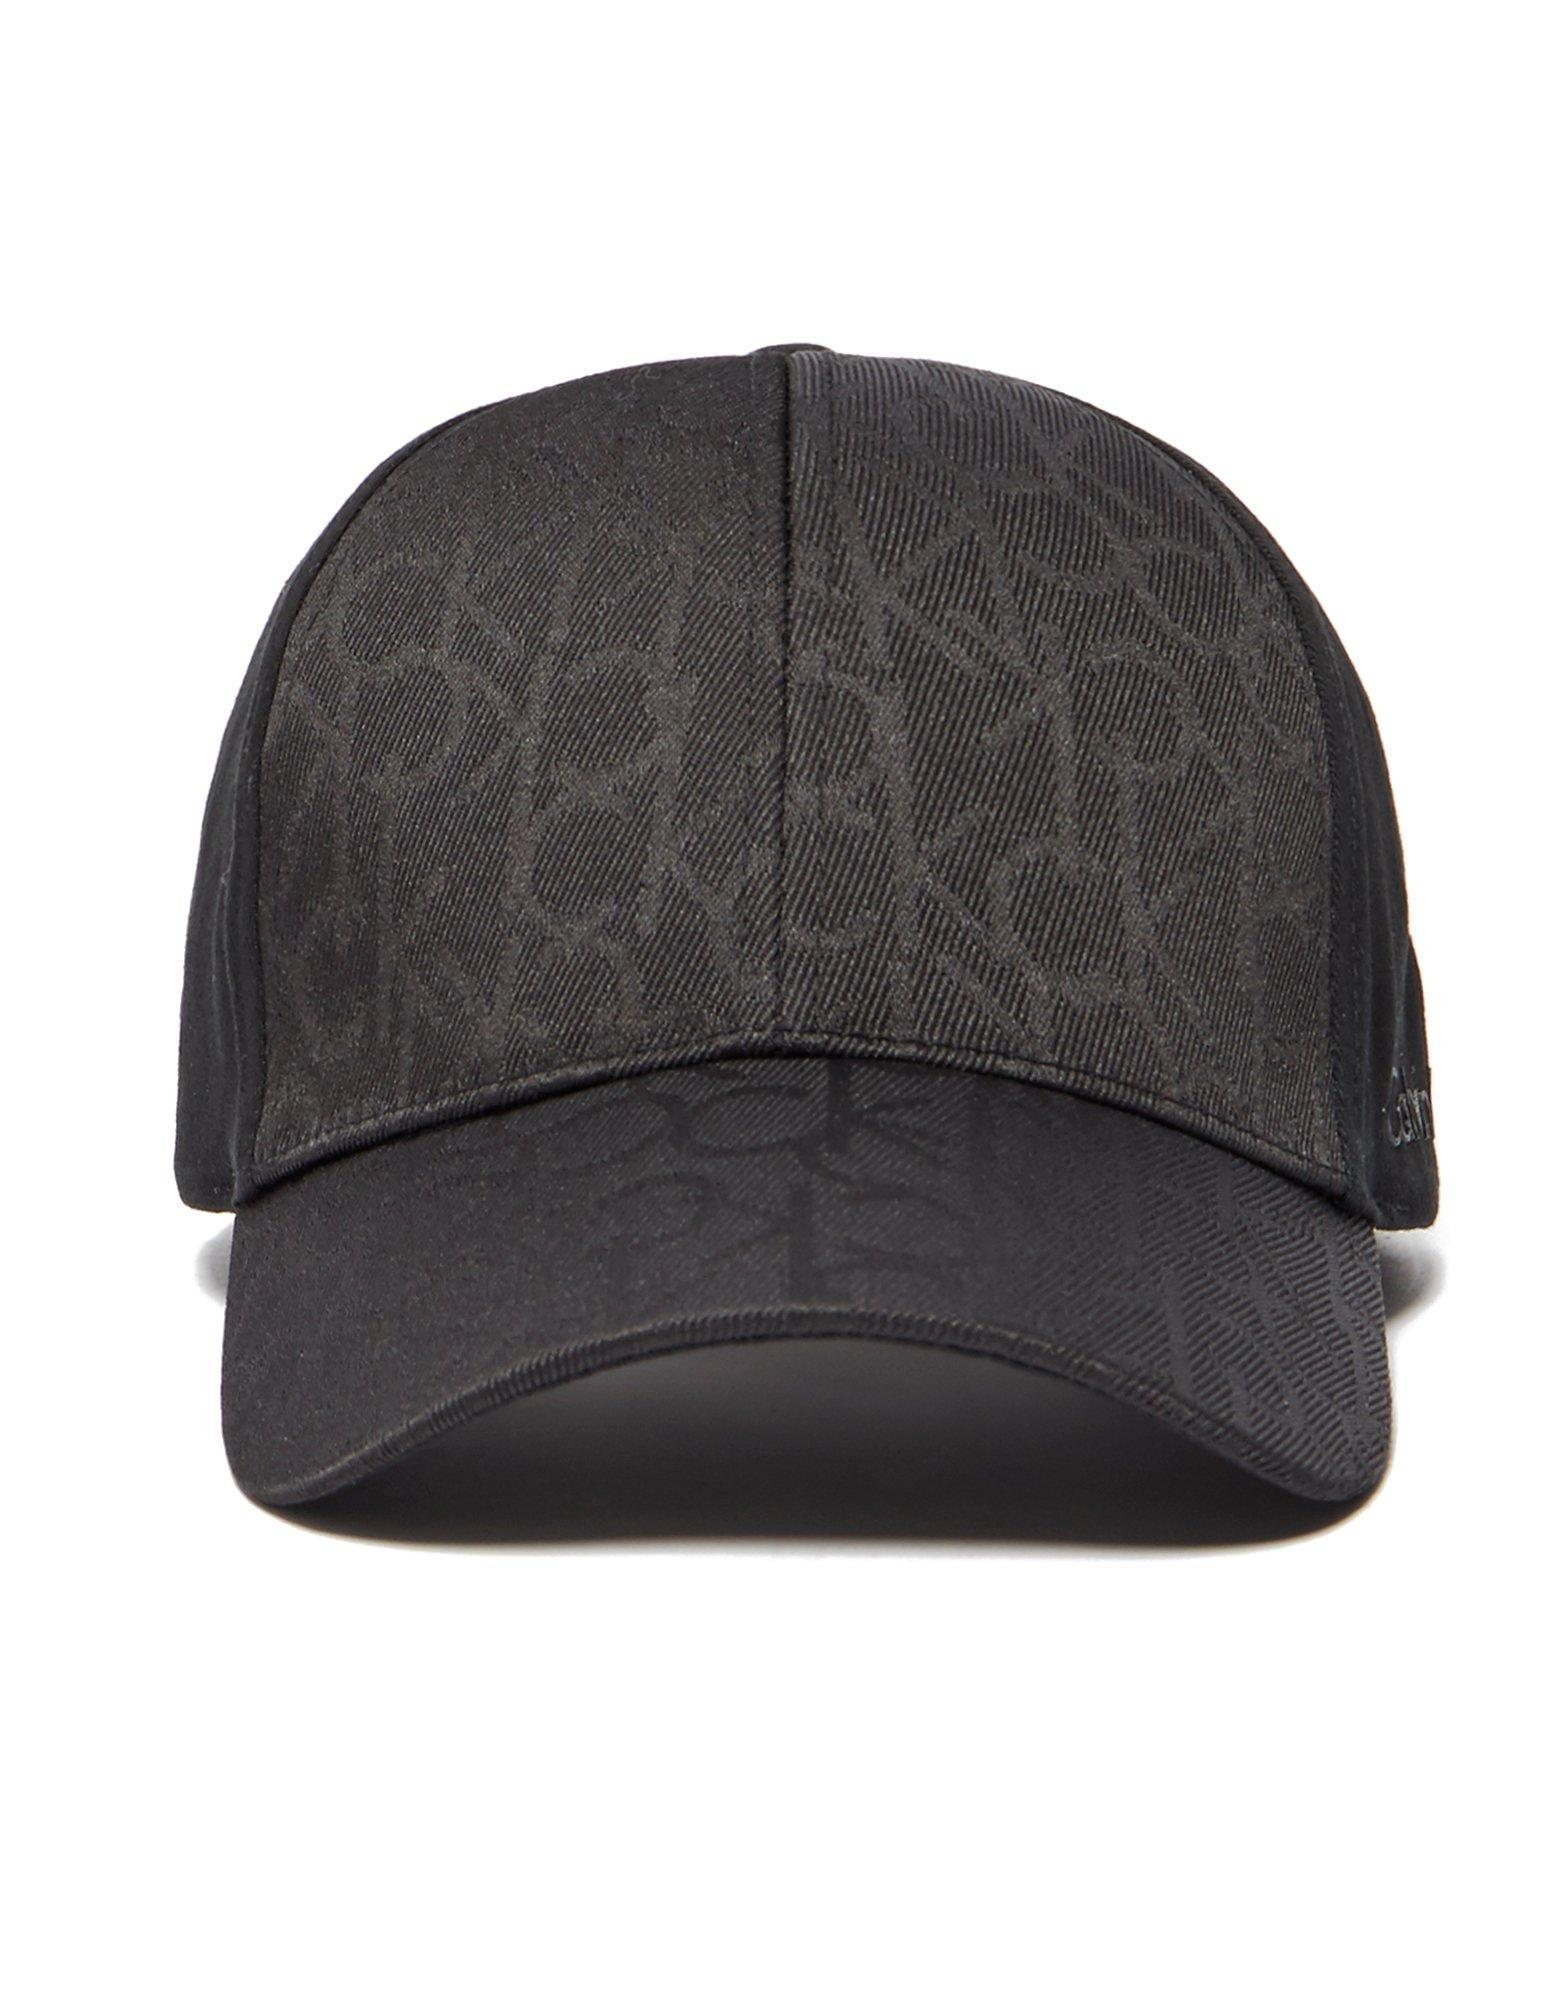 calvin klein power cap in black for men lyst. Black Bedroom Furniture Sets. Home Design Ideas